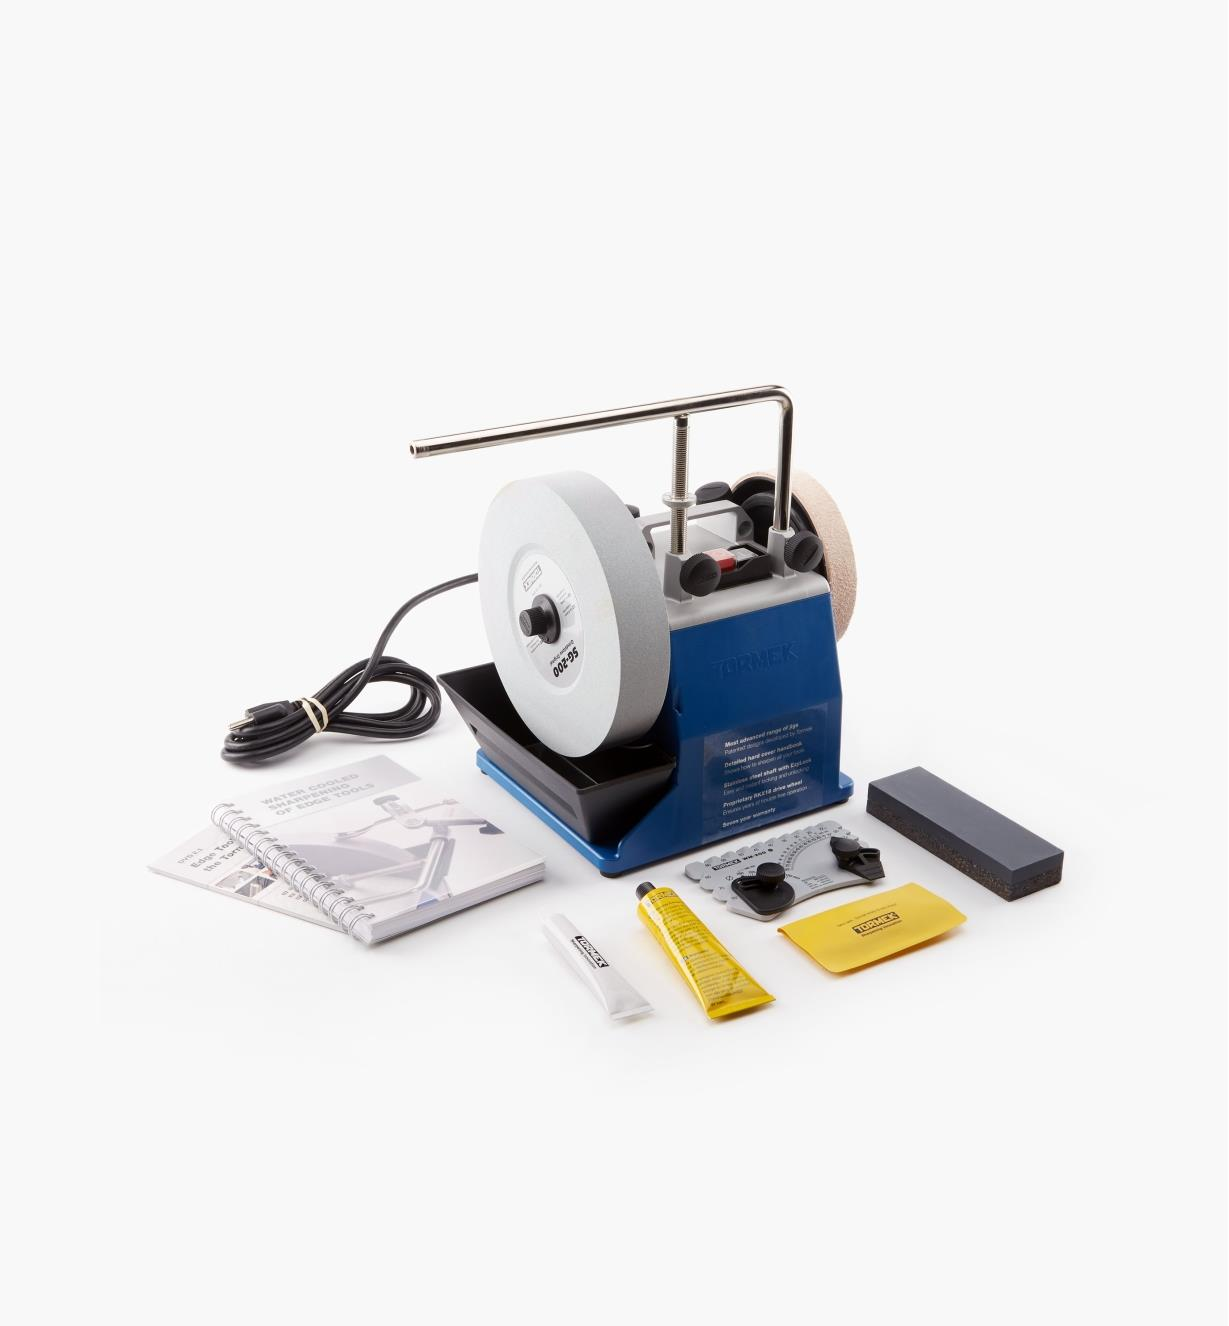 68M0104 - Tormek T-4 Sharpening System